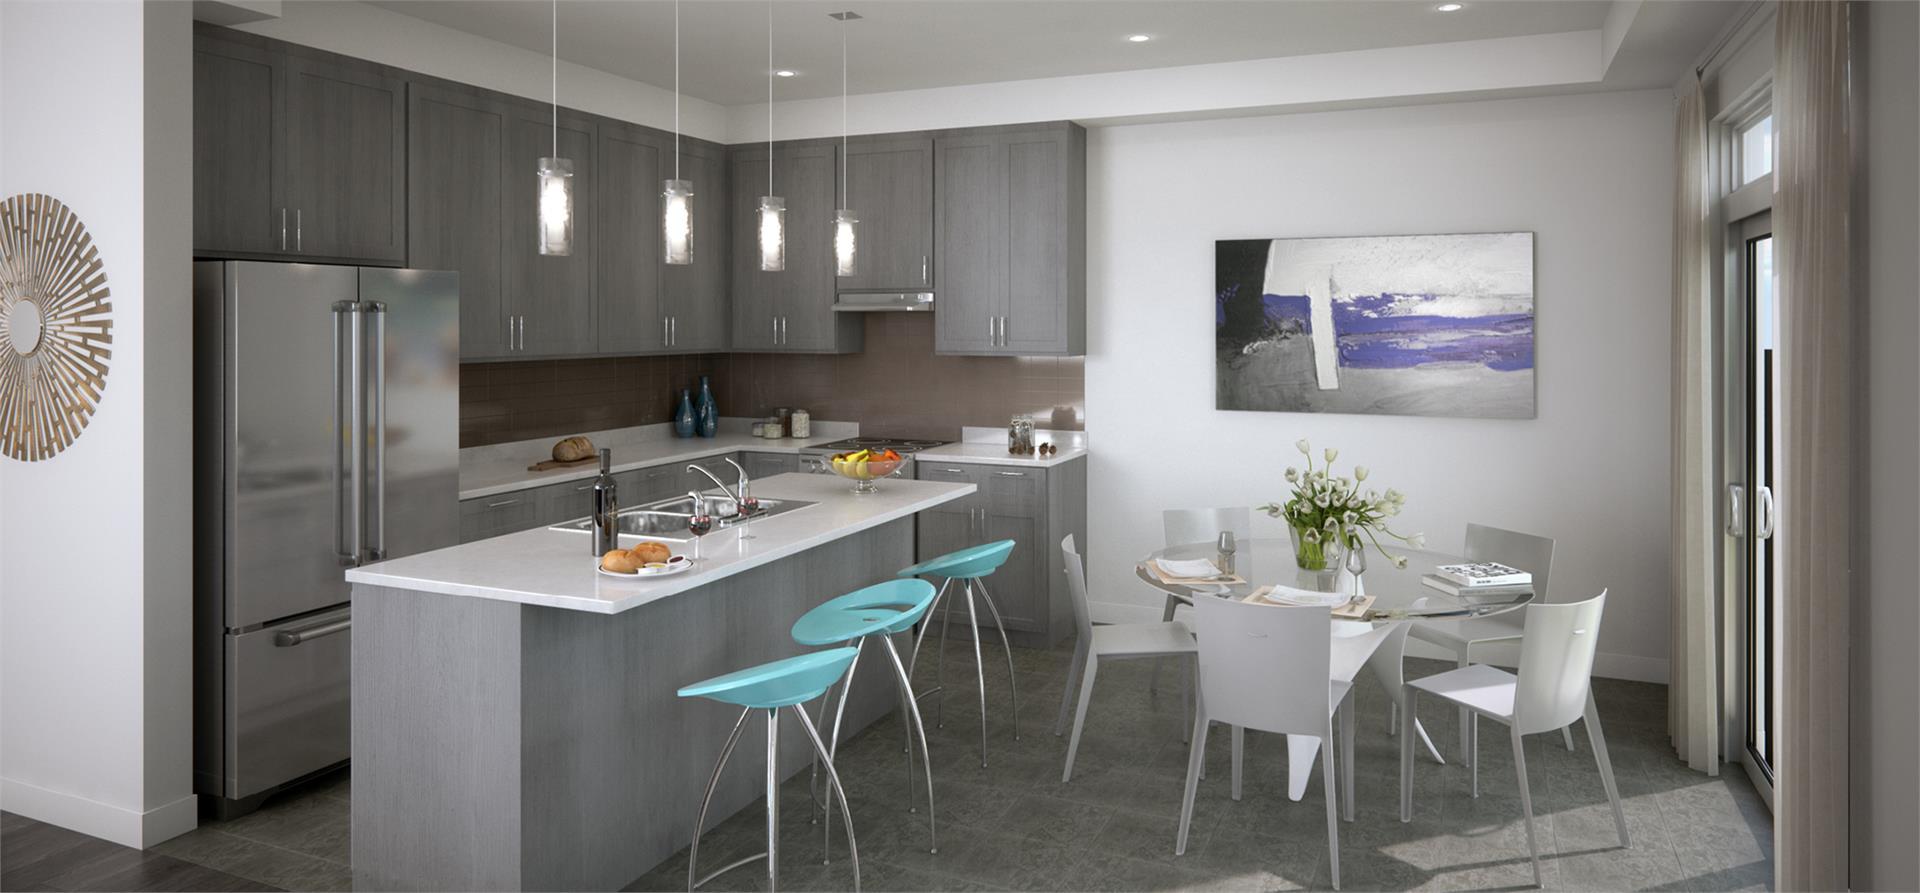 2016_12_14_10_30_41_eden_oak_indigo_estates_collingwood_interior_rendering_kitchen1